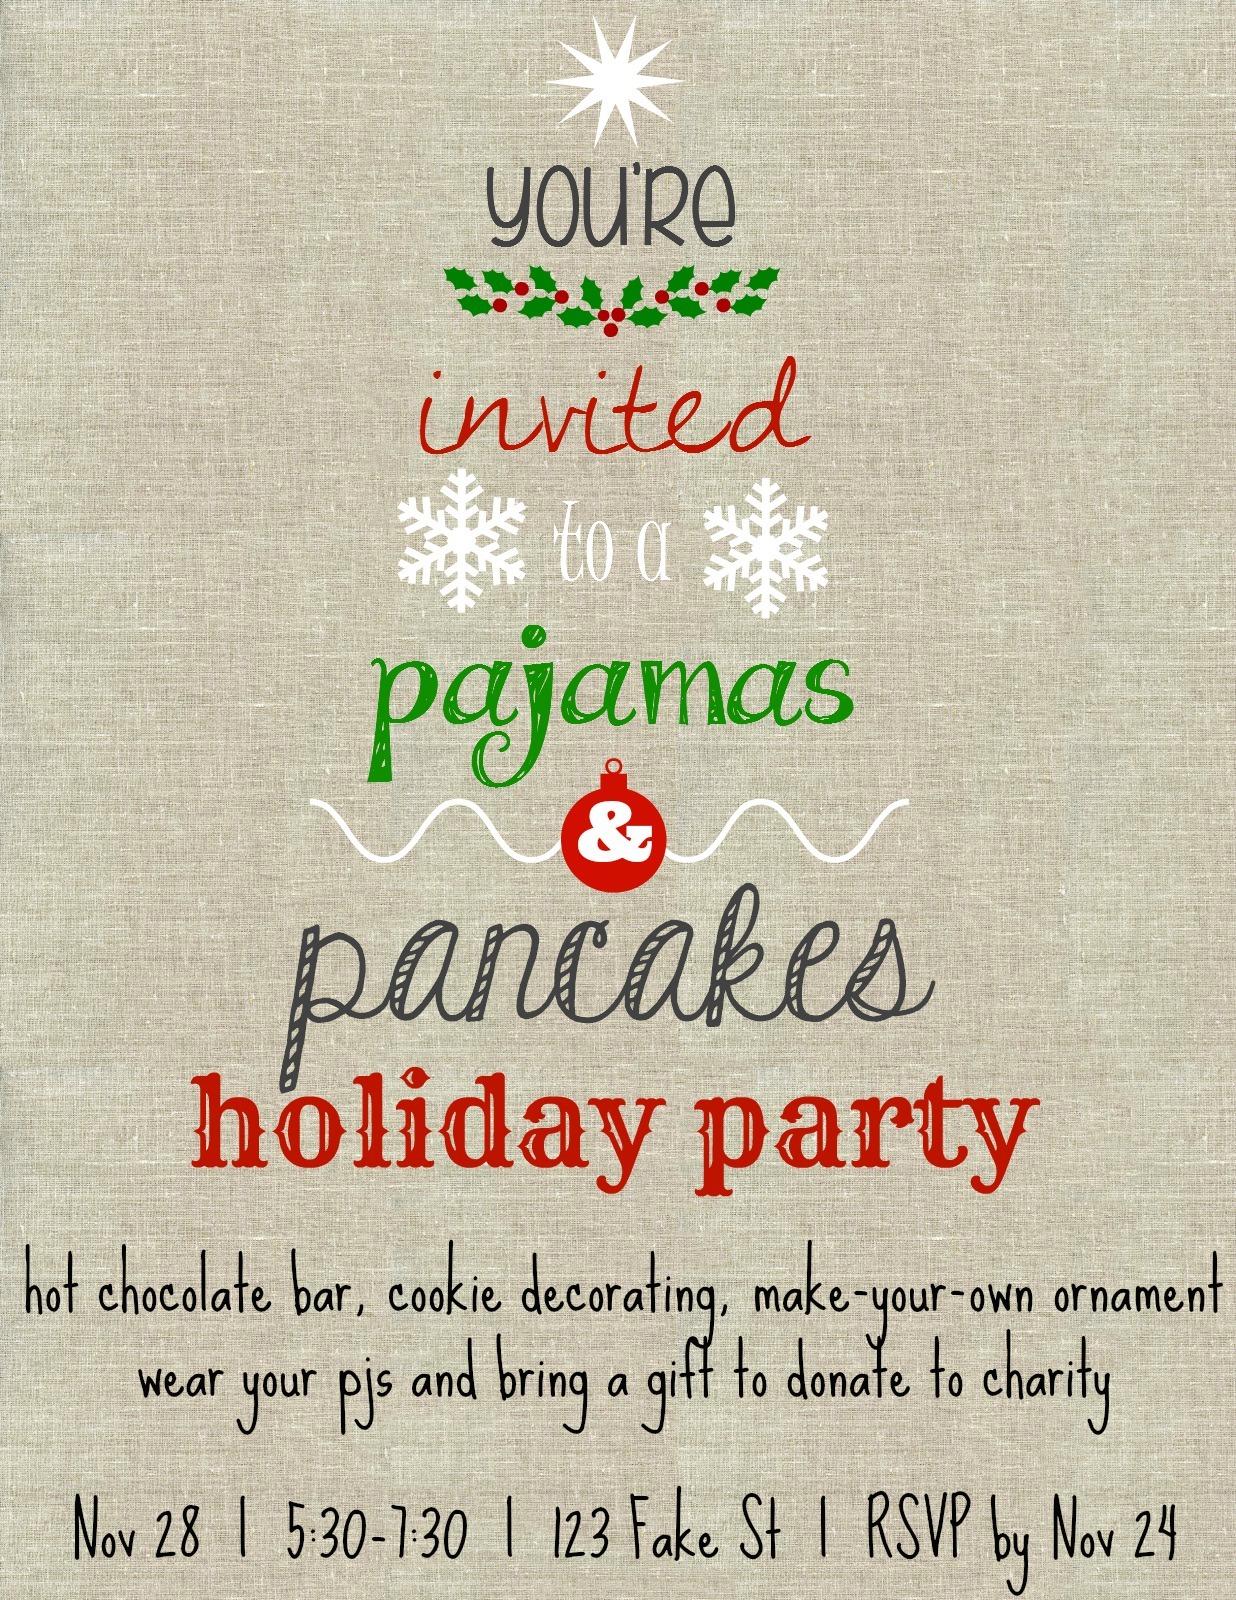 Holiday Pajamas   Pancakes Family Party  37a42c57e